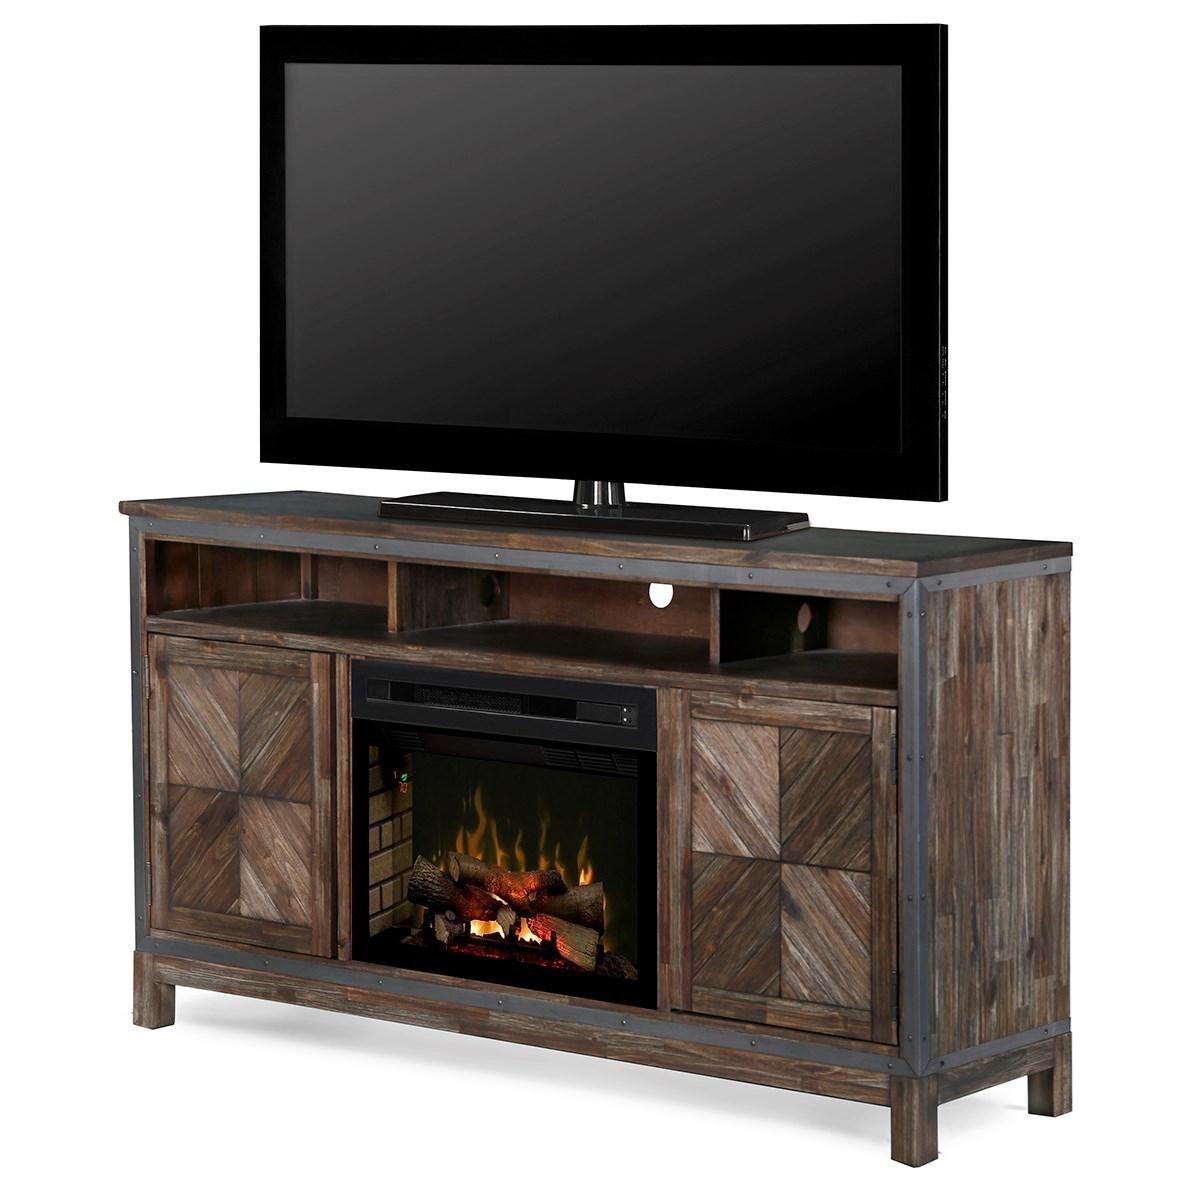 Wyatt Media Mantel Fireplace